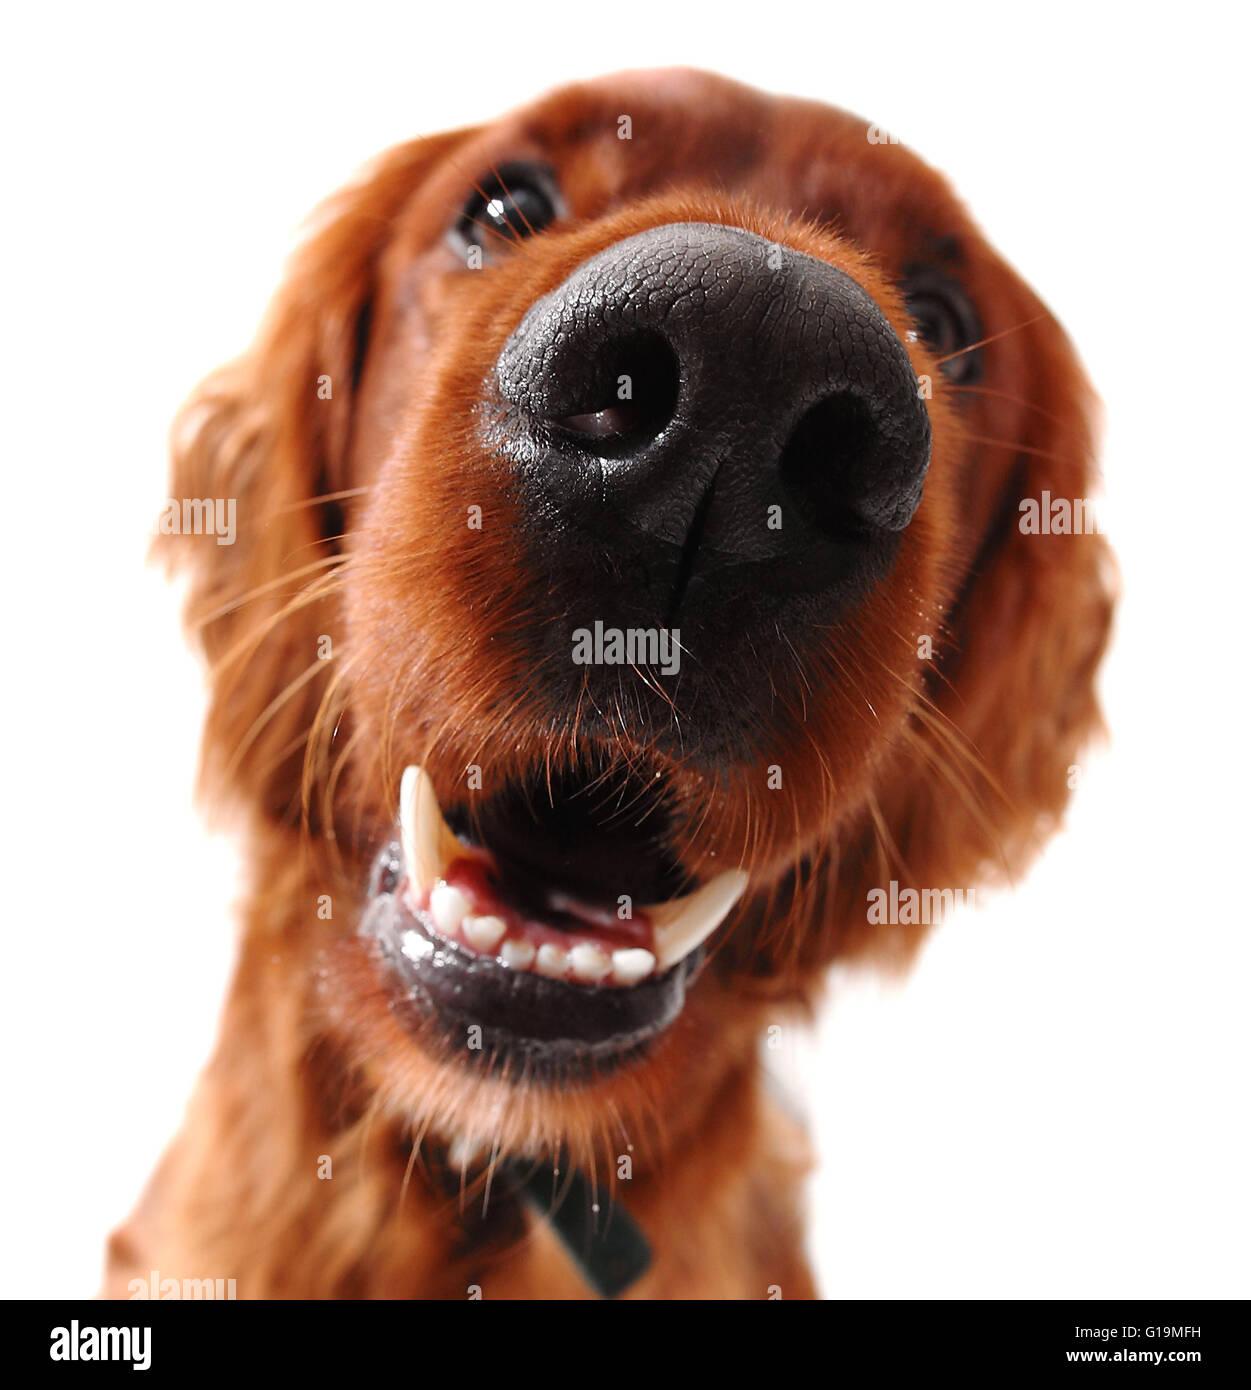 Irish setter dog, taken at fun angle with wide angle lens Stock Photo